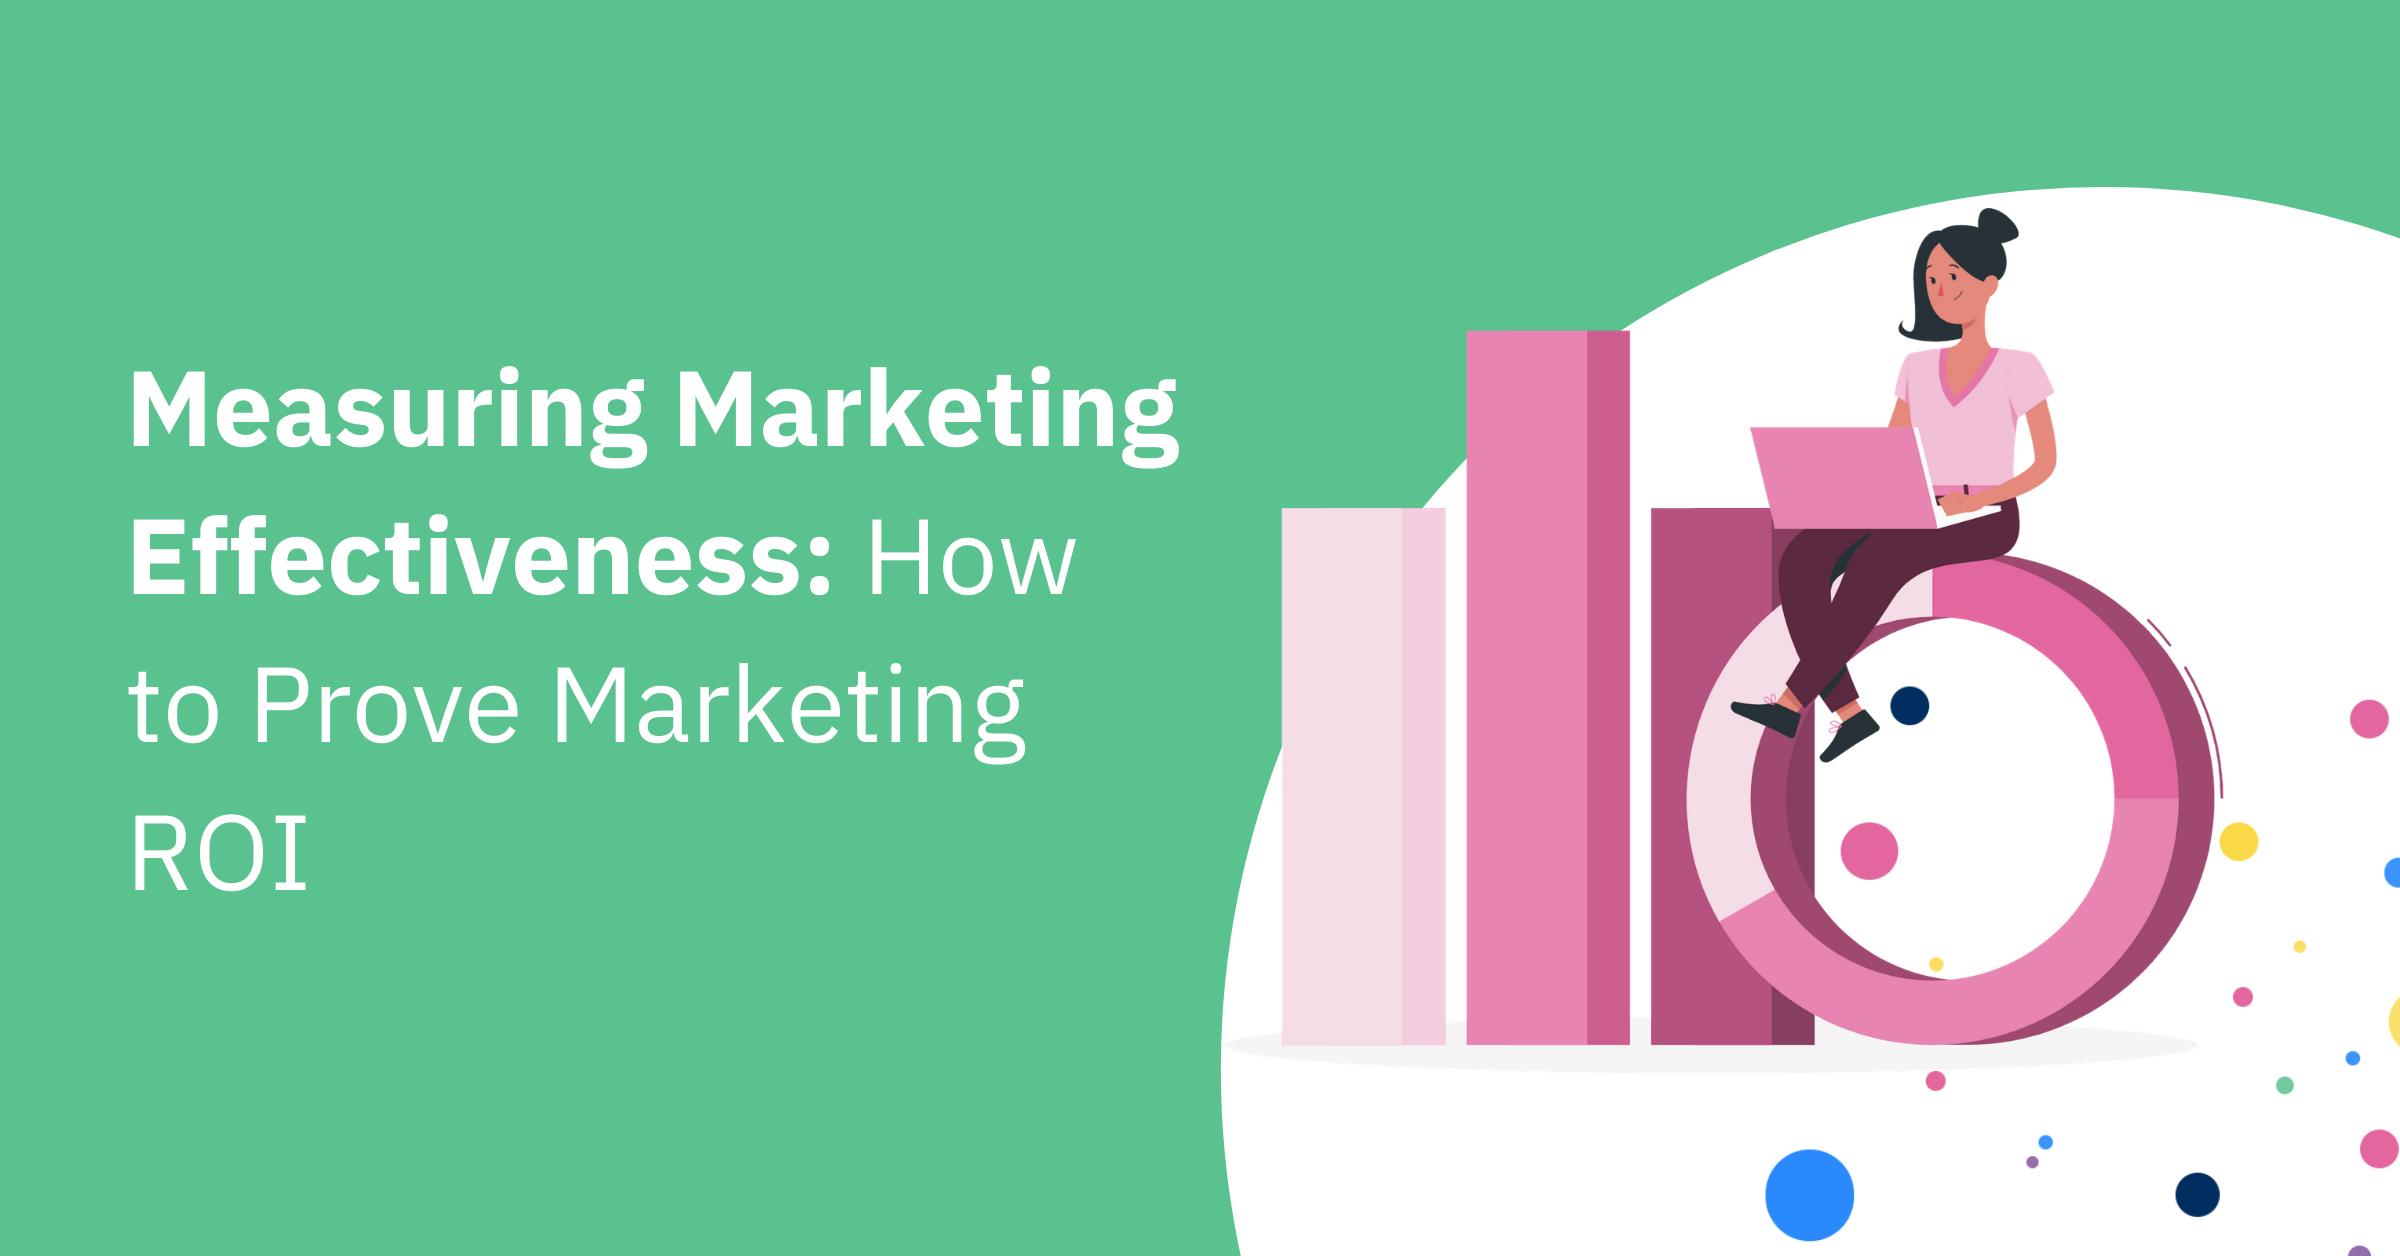 Measuring Marketing Effectiveness: How to Prove Marketing ROI